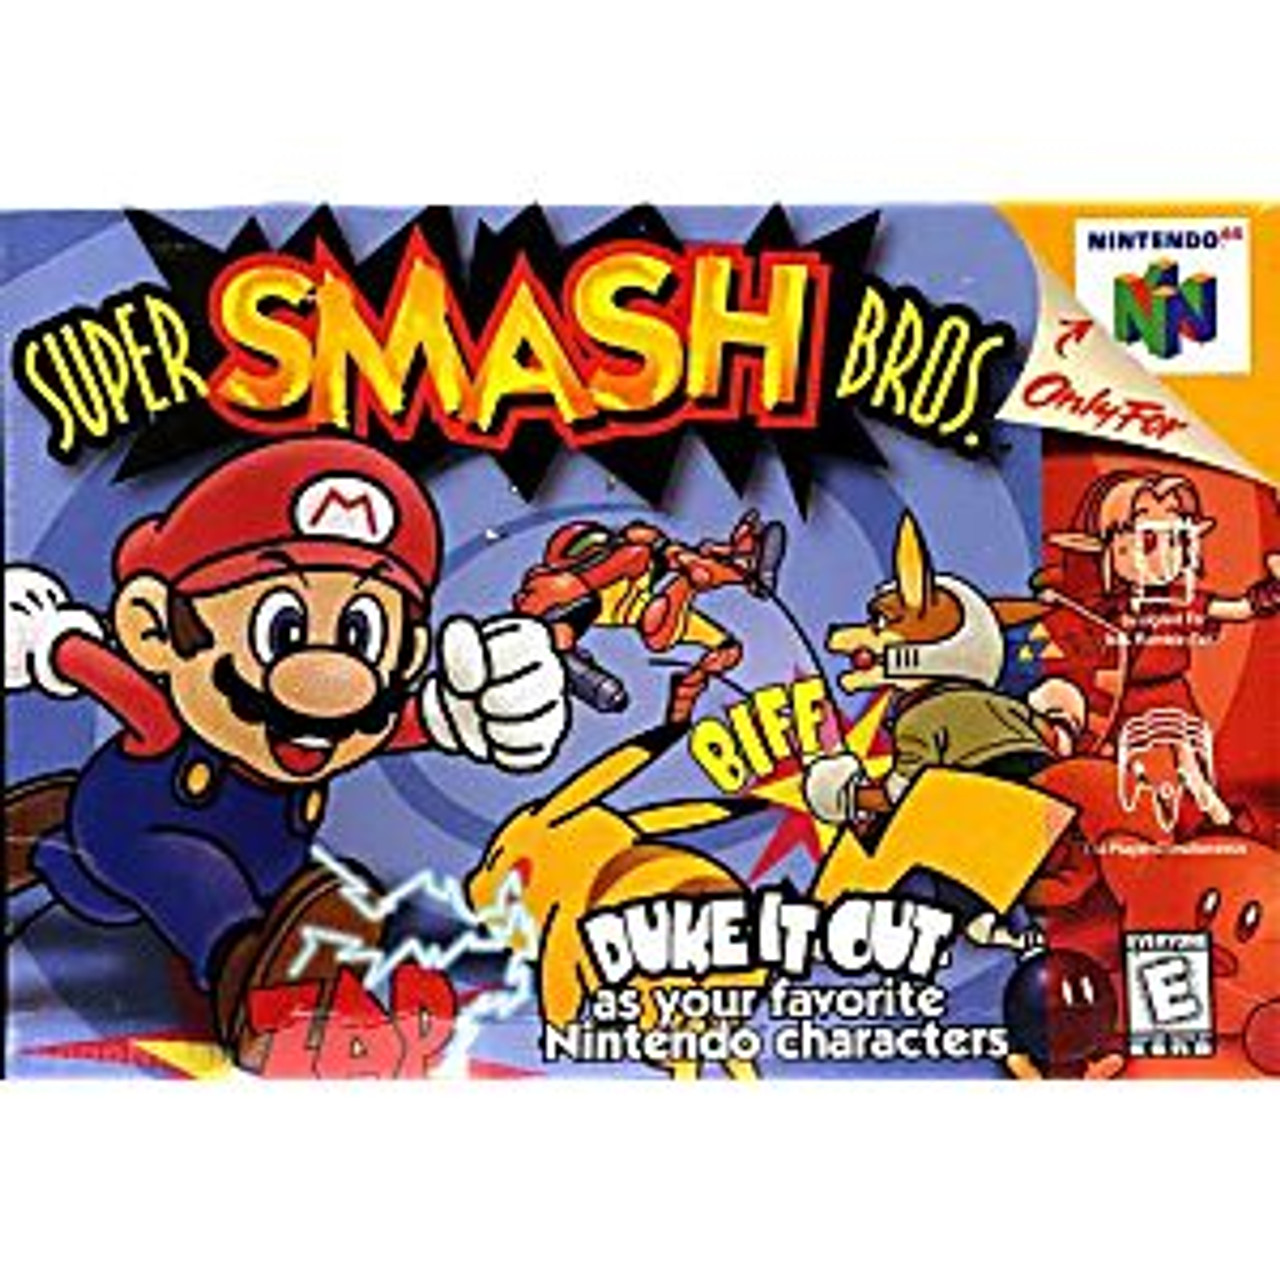 3. SUPER SMASH BROTHERS - N64